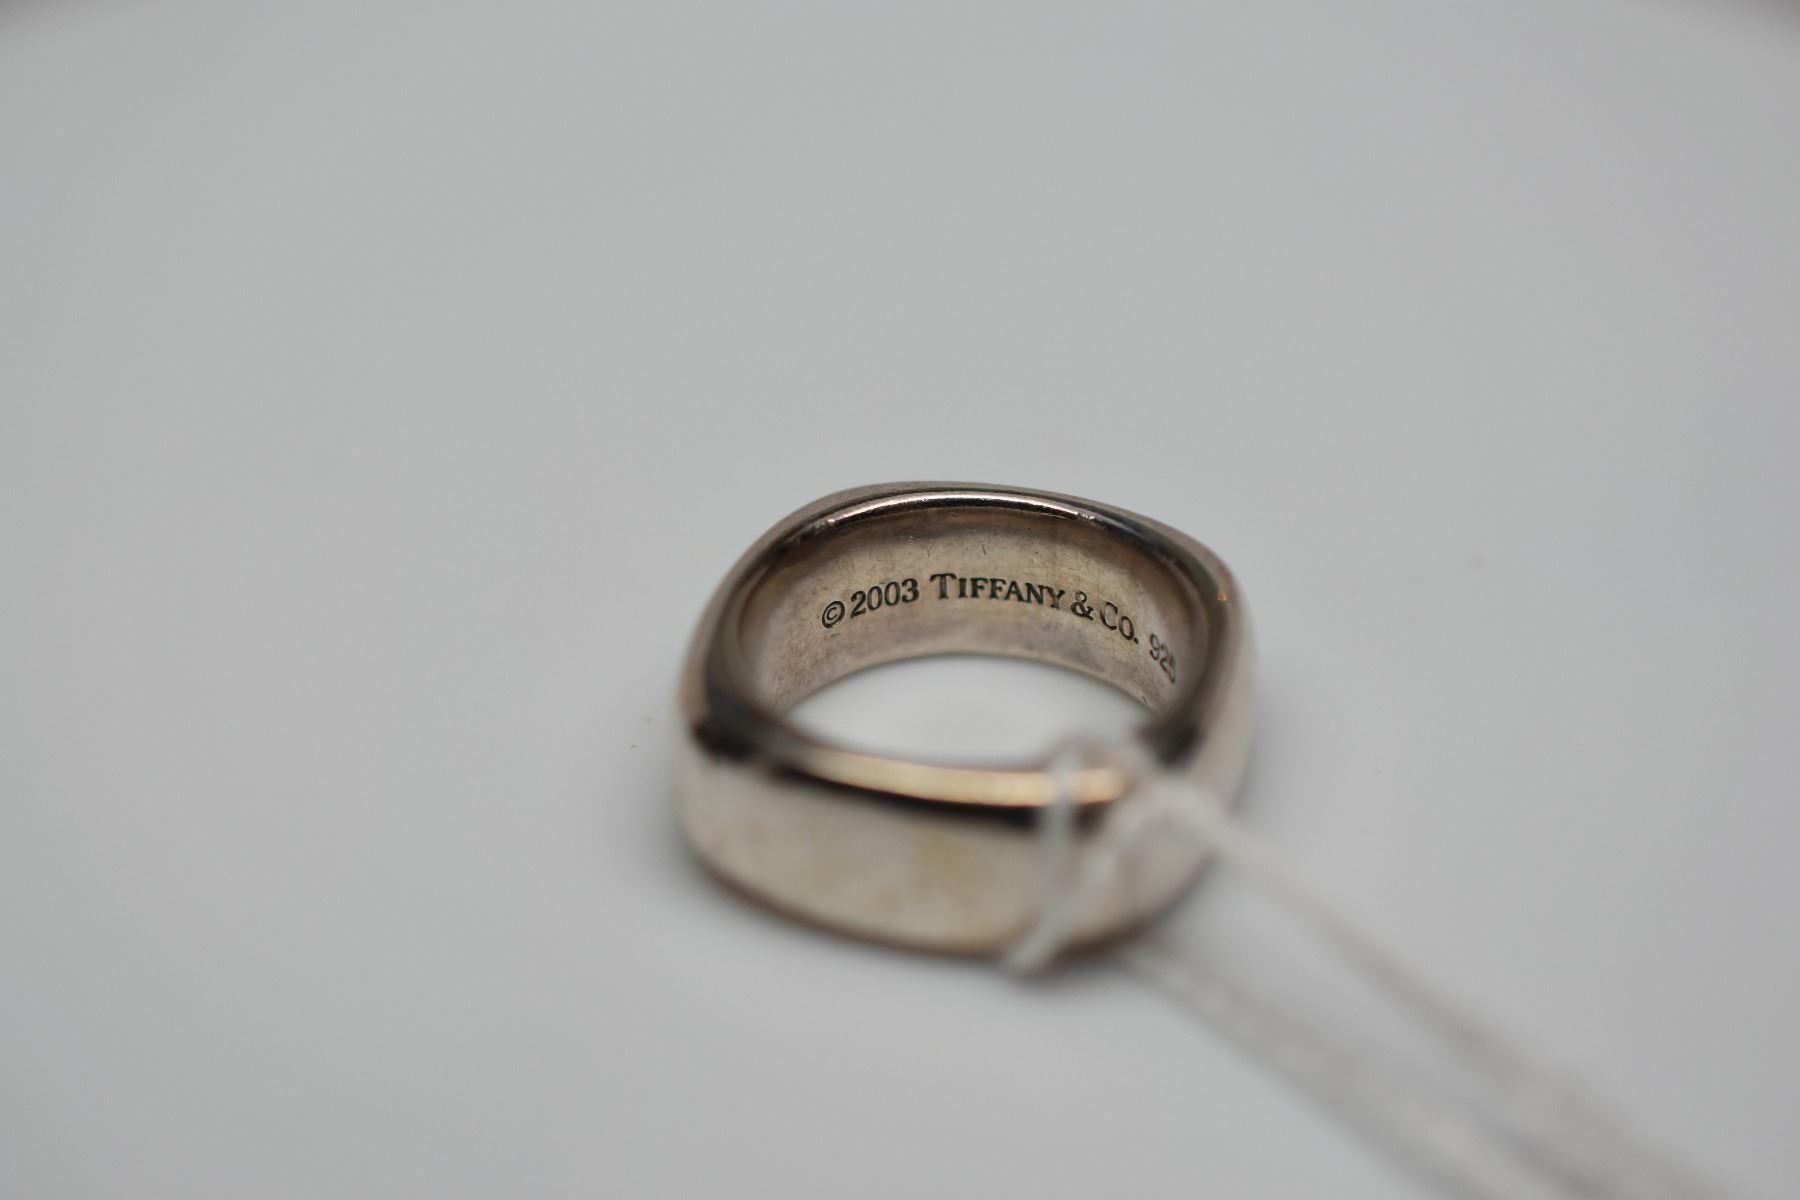 d6a51f3da Image 1 : Tiffany & Co. Sterling Silver Square Cushion Ring Size 6 ...